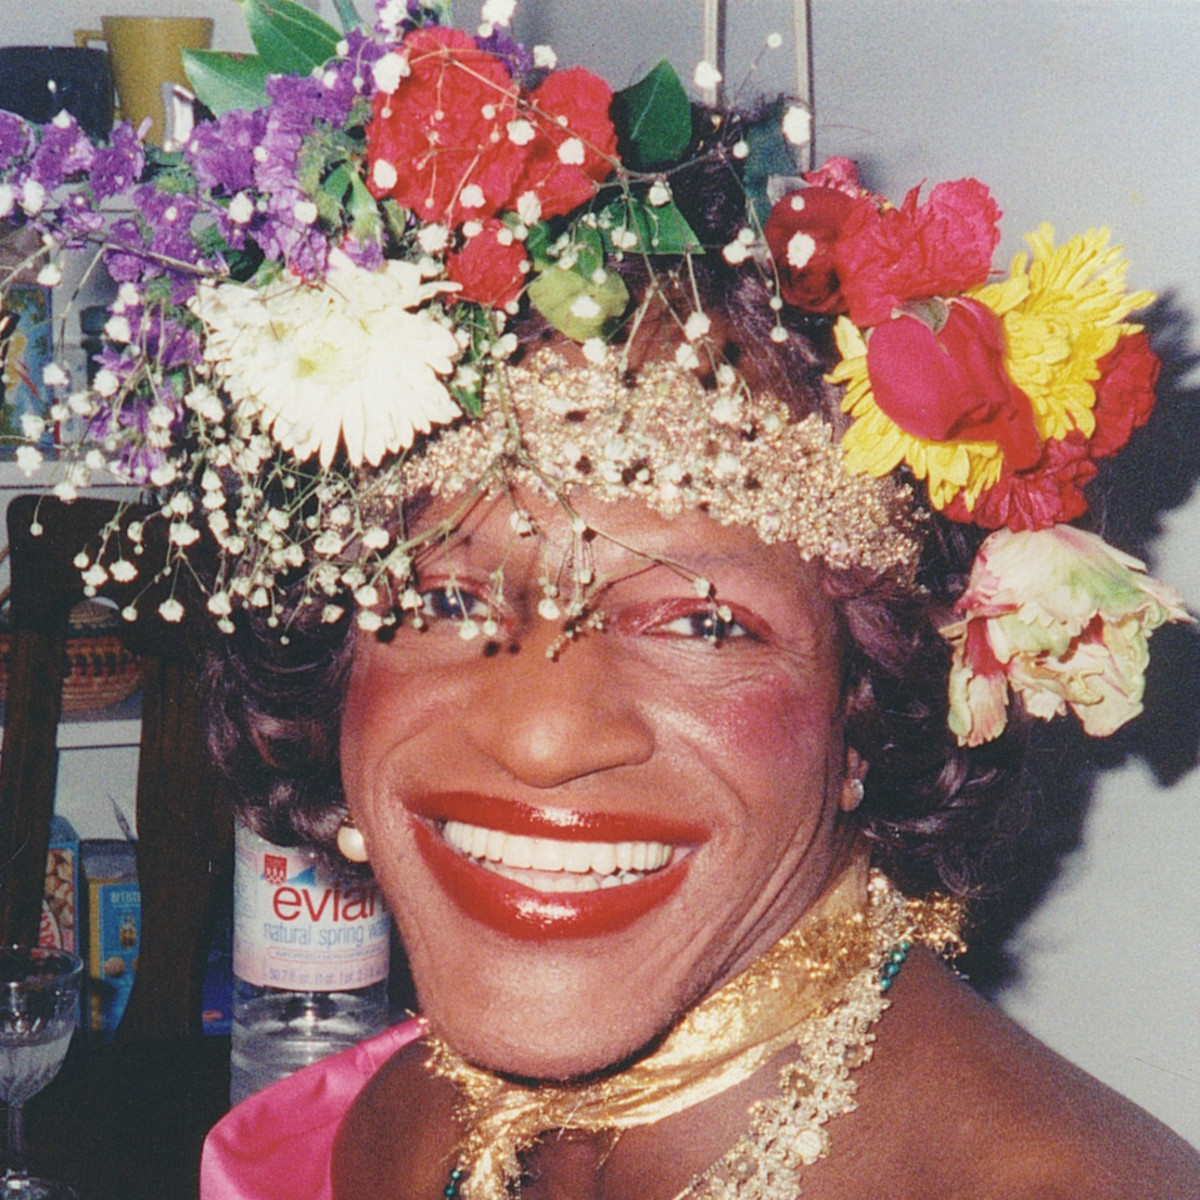 Marsha P. Johnson, Black HIstory LGBTQ Iinfluencer